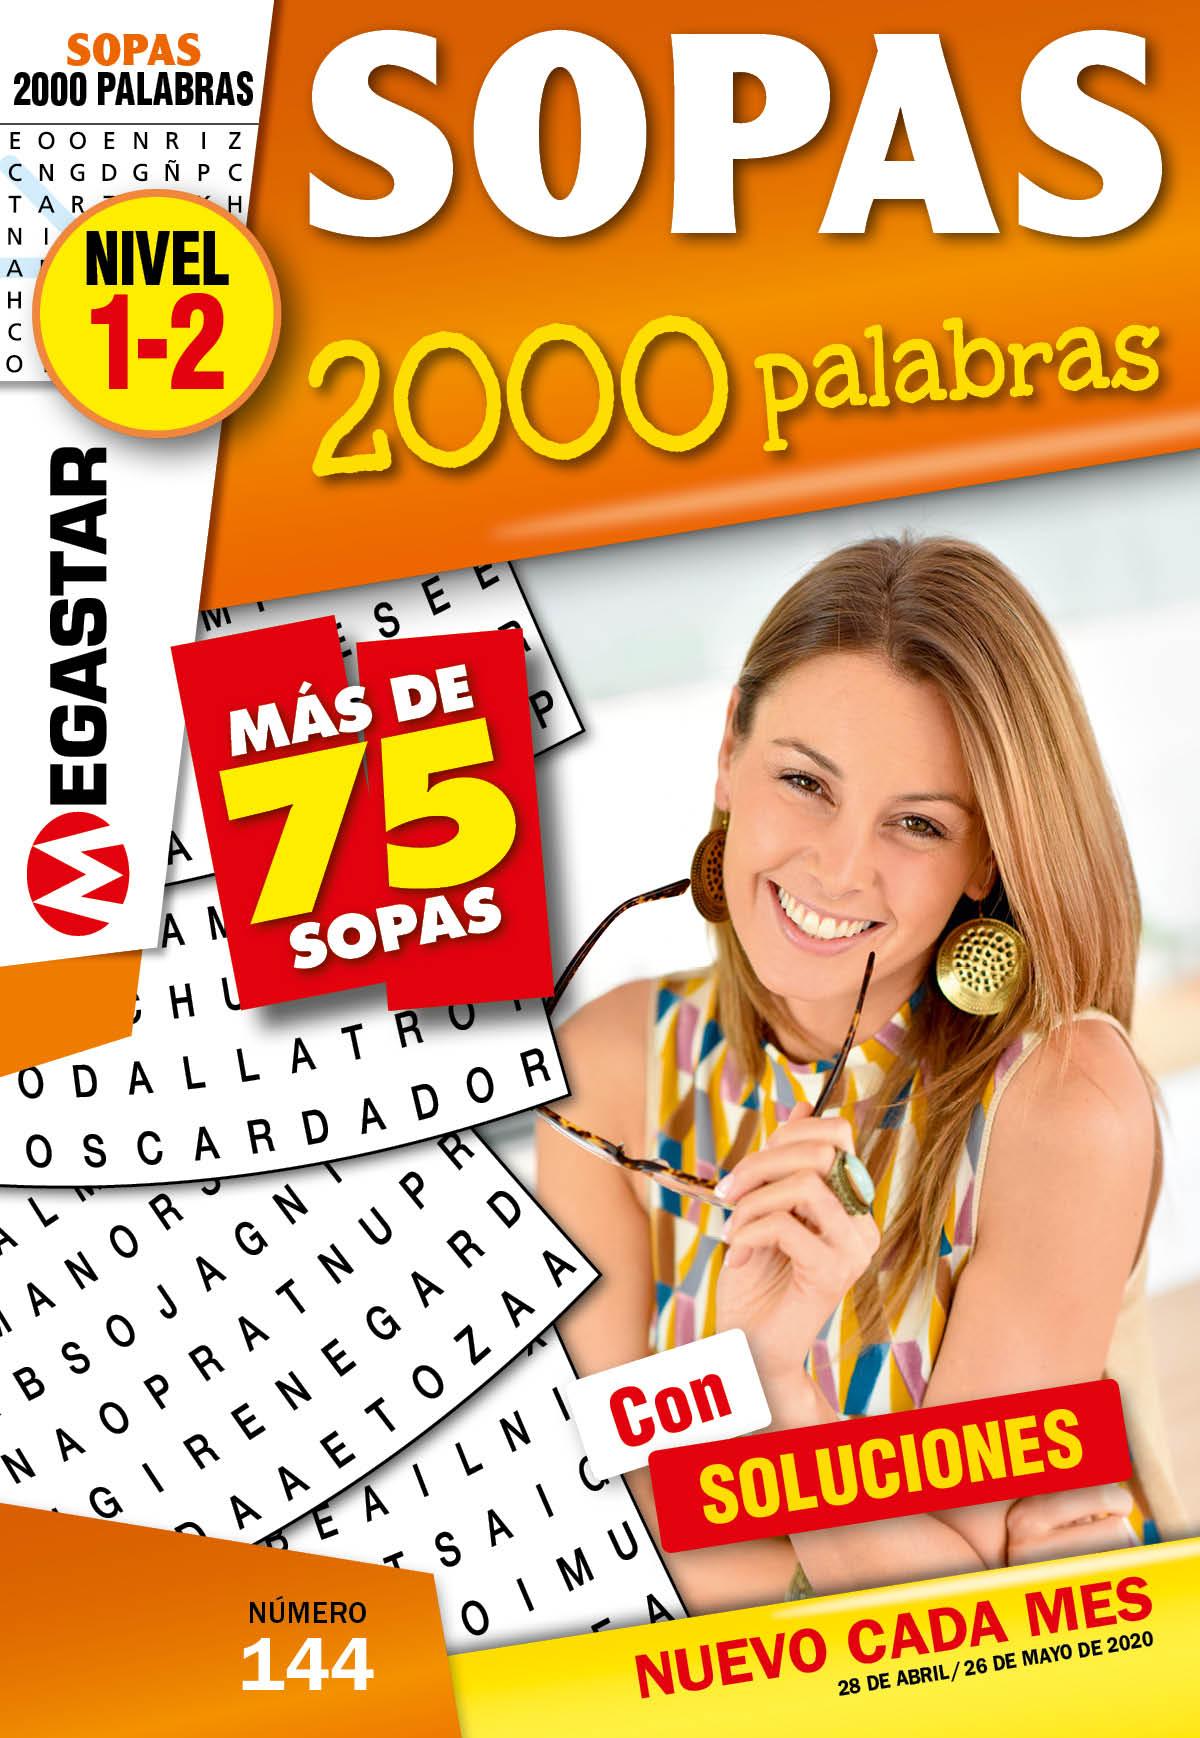 Sopas 2000 Palabras